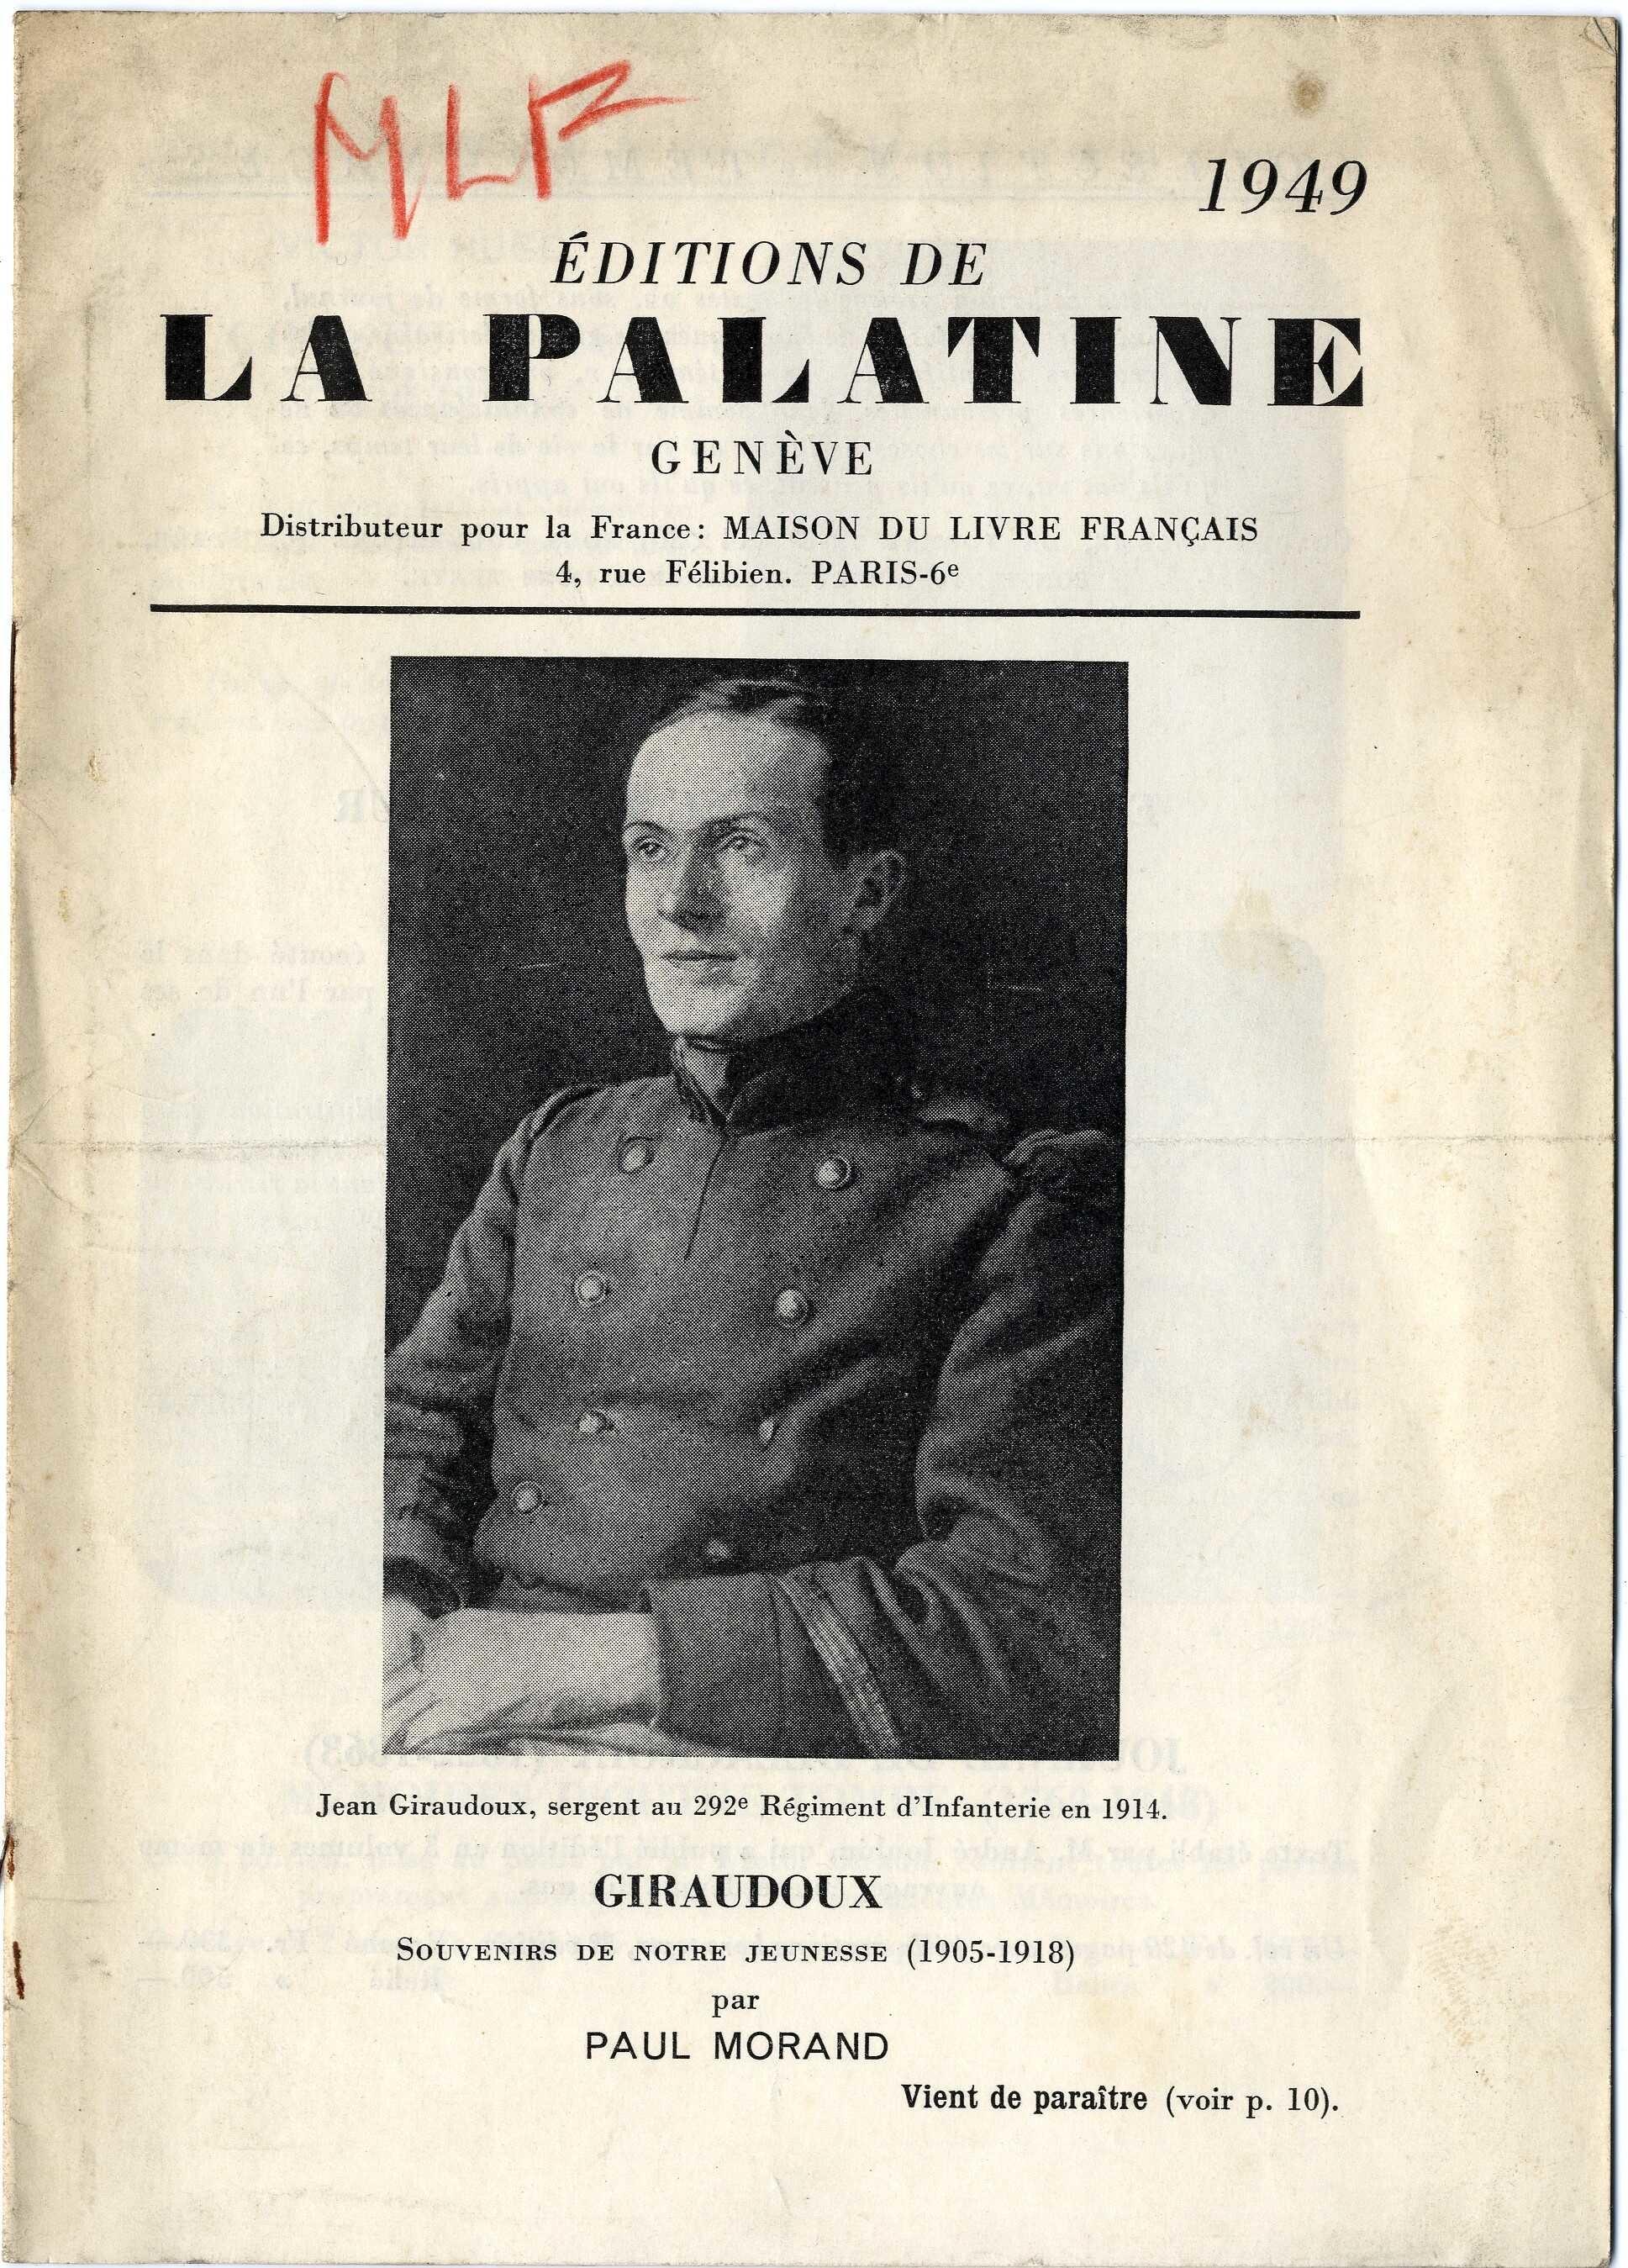 image for La Palatine